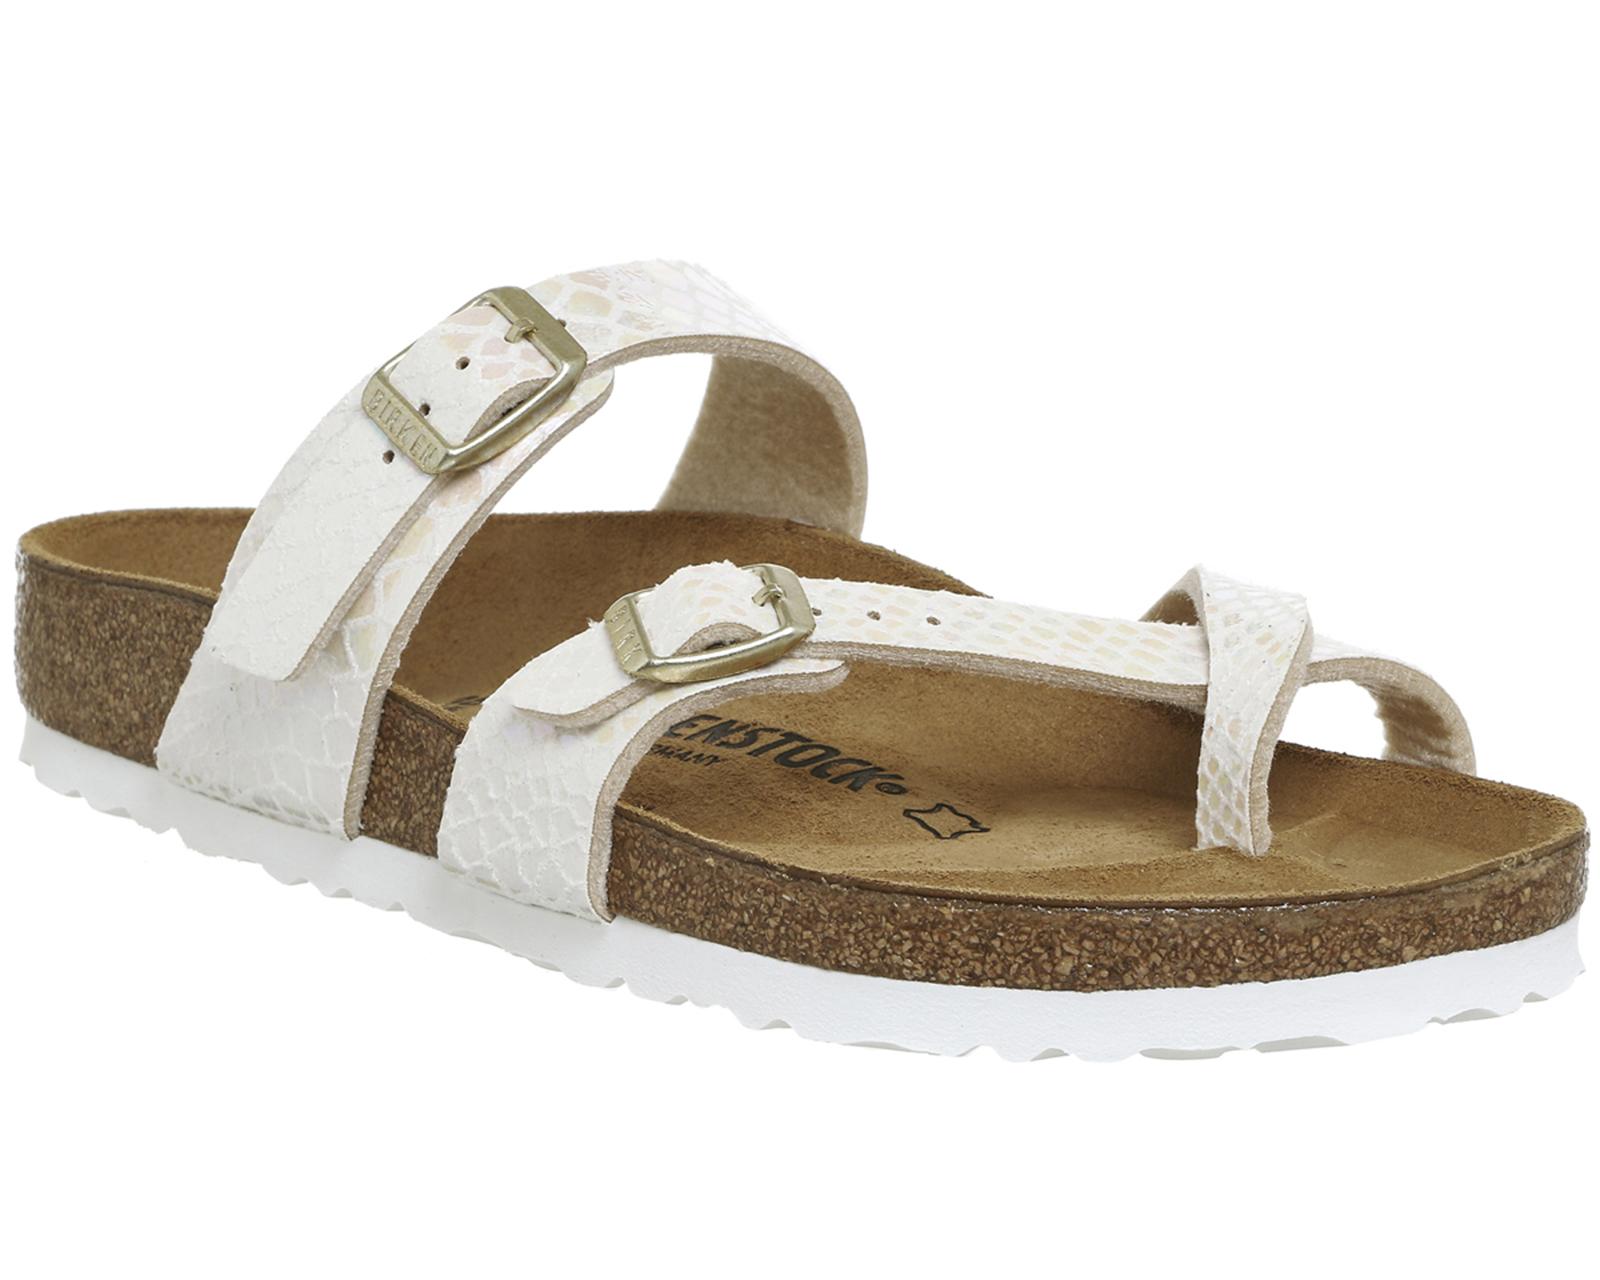 Womens Birkenstock Mayari Cross Strap Sandals Shiny Snake Cream Sandal Strape On